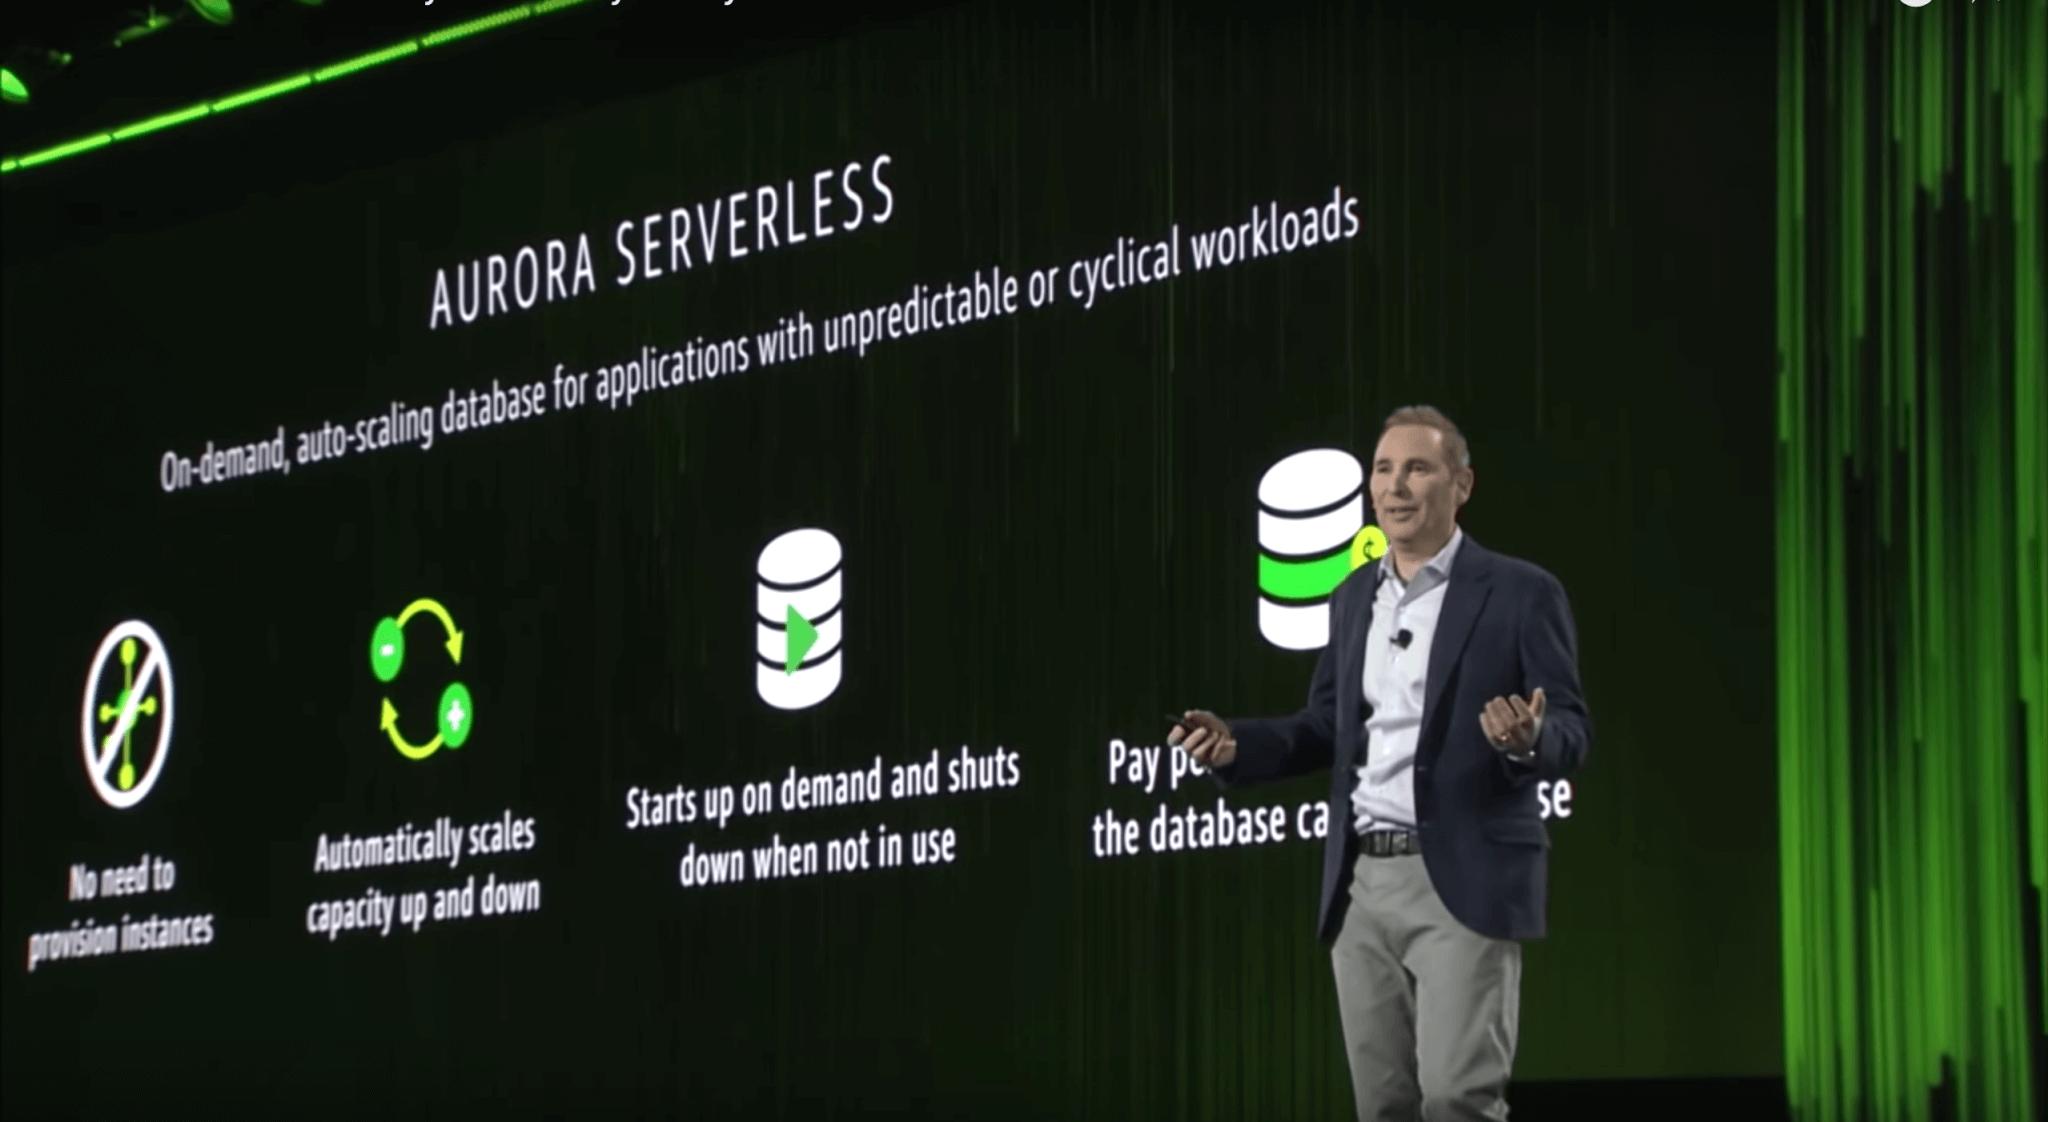 AWS Announcements at re:Invent 2017 - Aurora Serverless